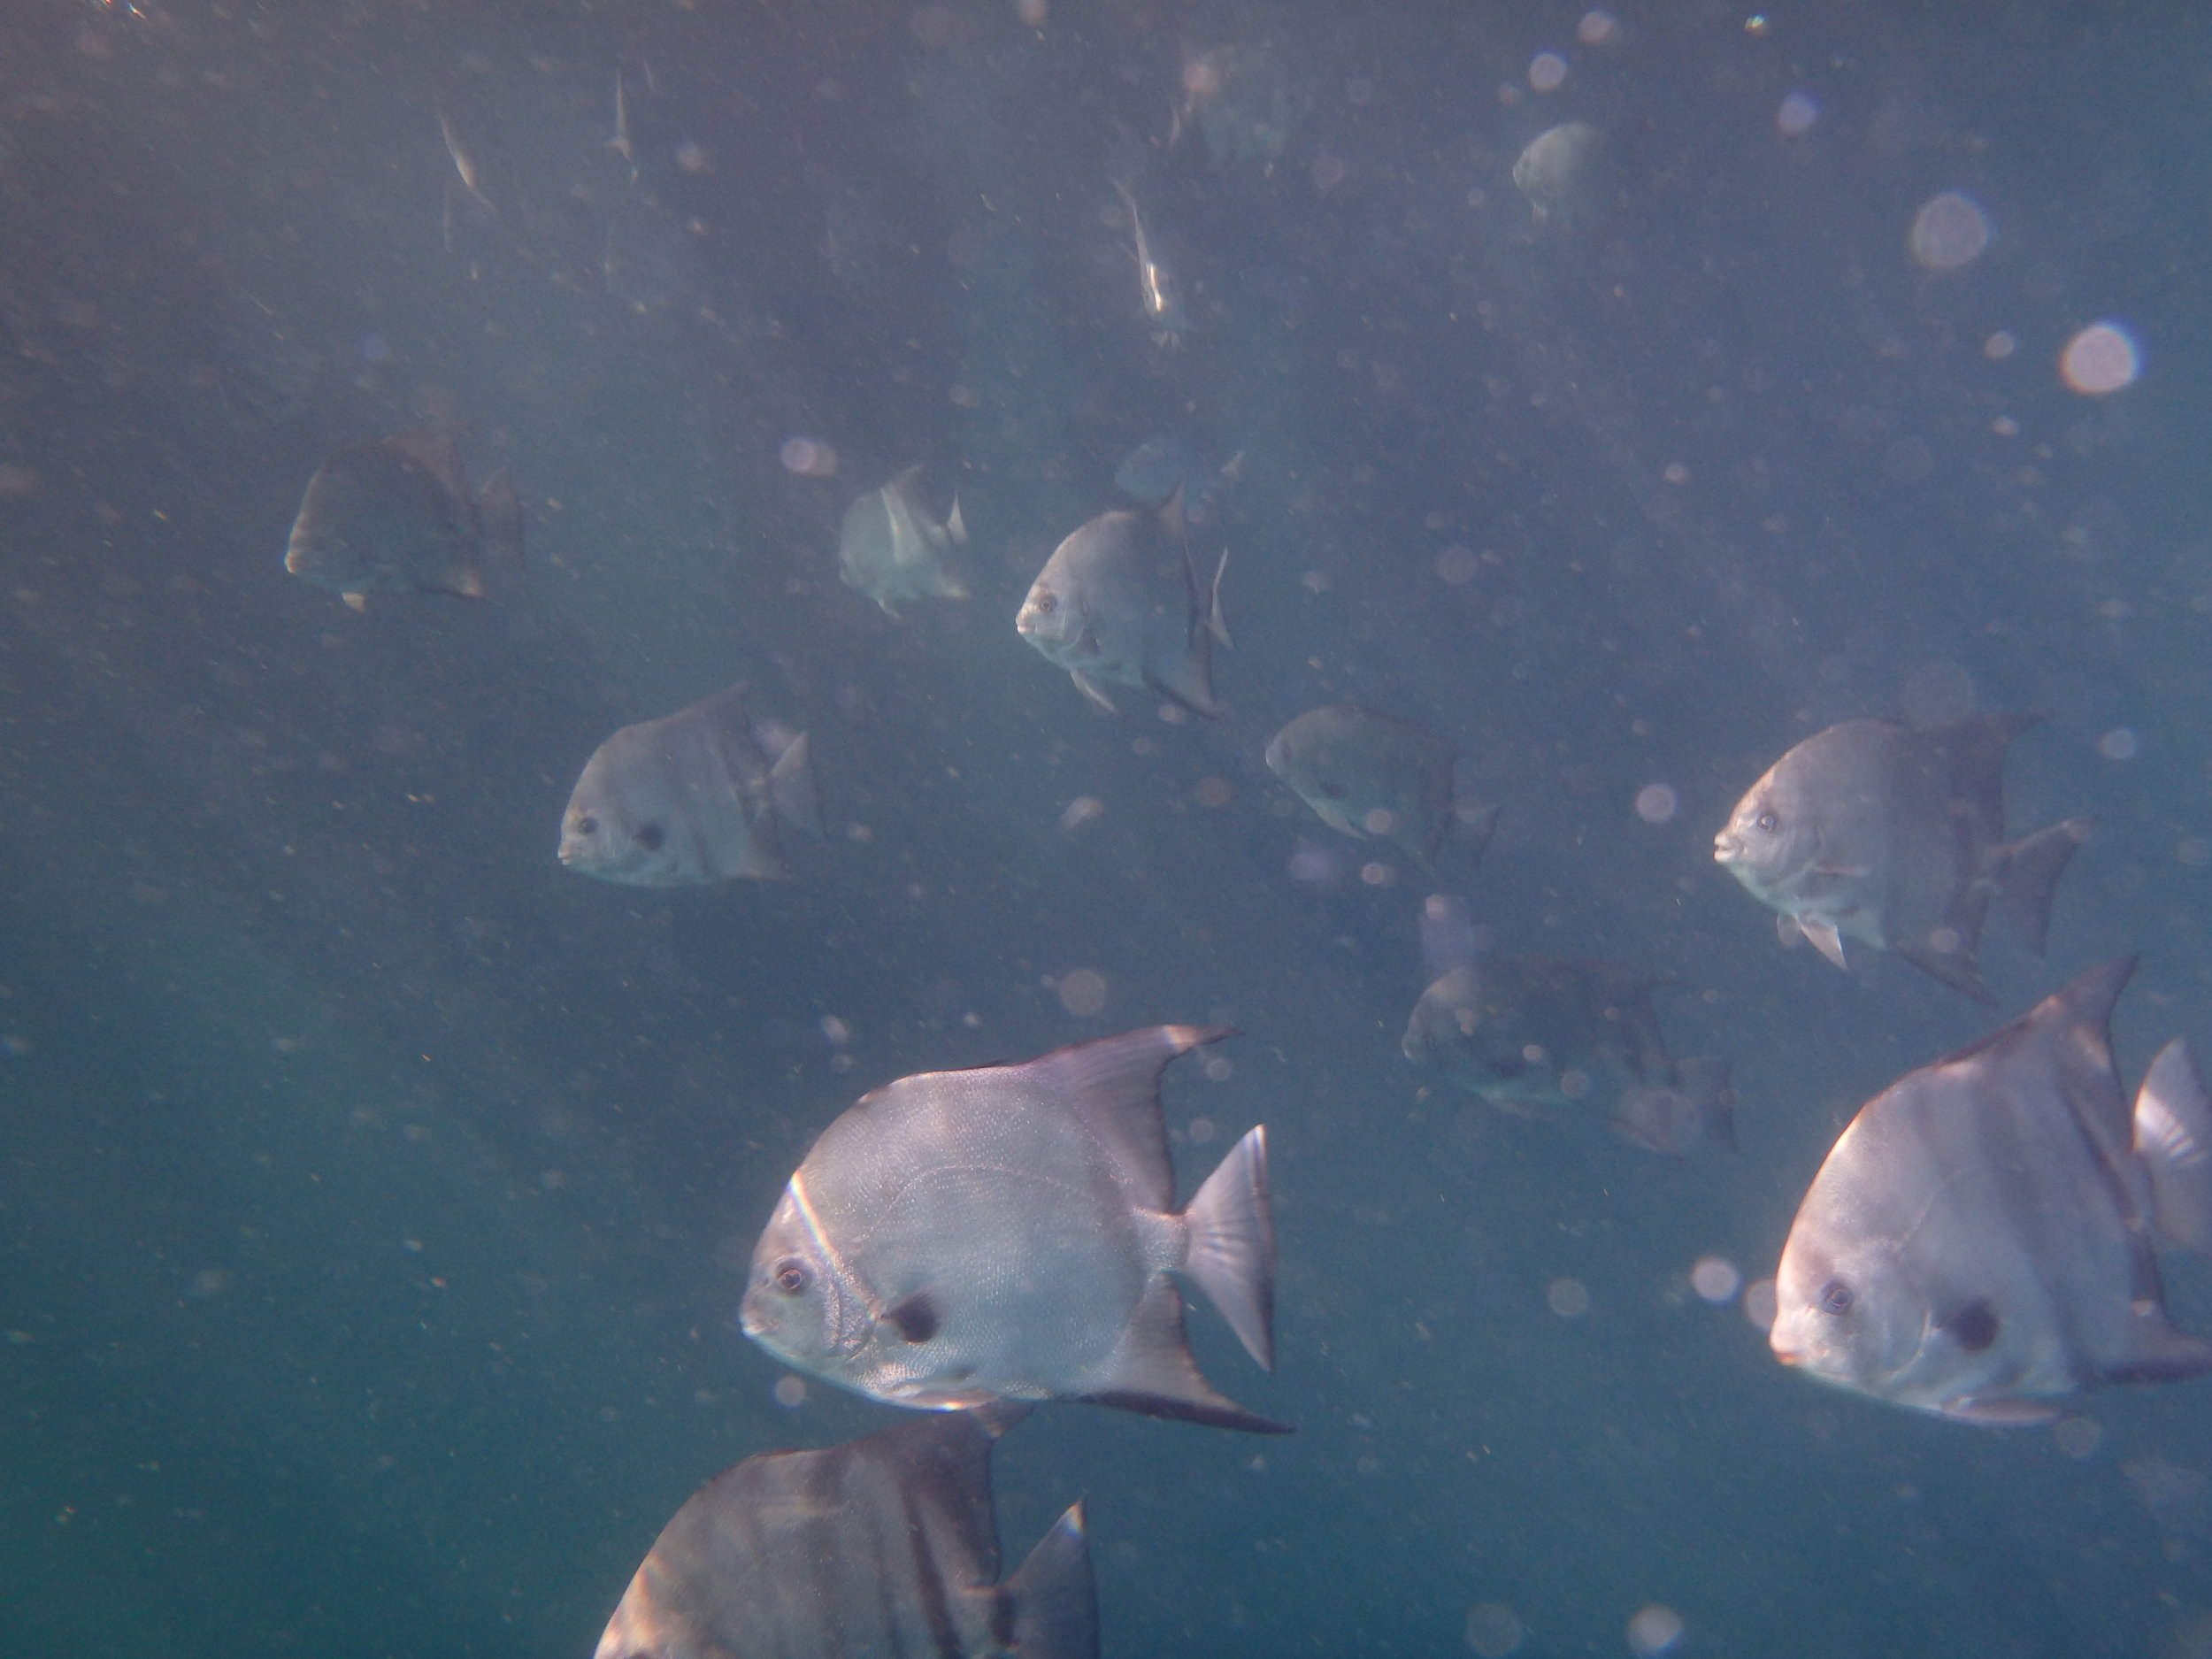 Atlantic Spadefish 2 miles off the beach